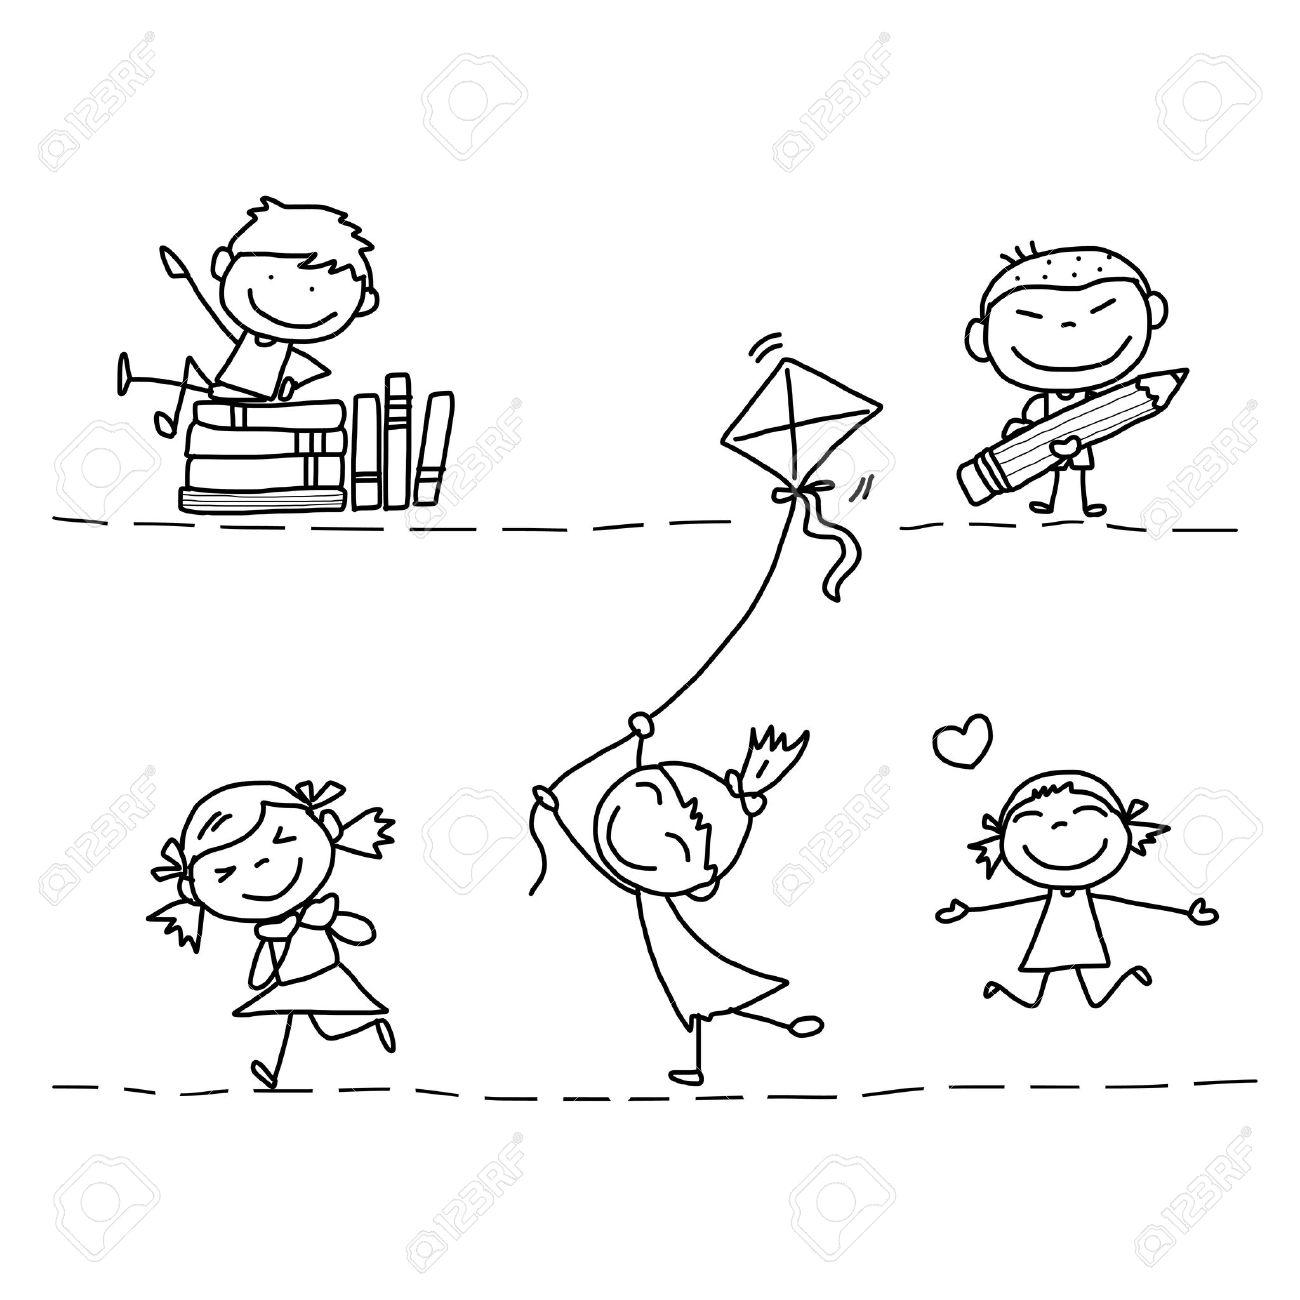 set of hand drawing cartoon happy kids playing - 21396896